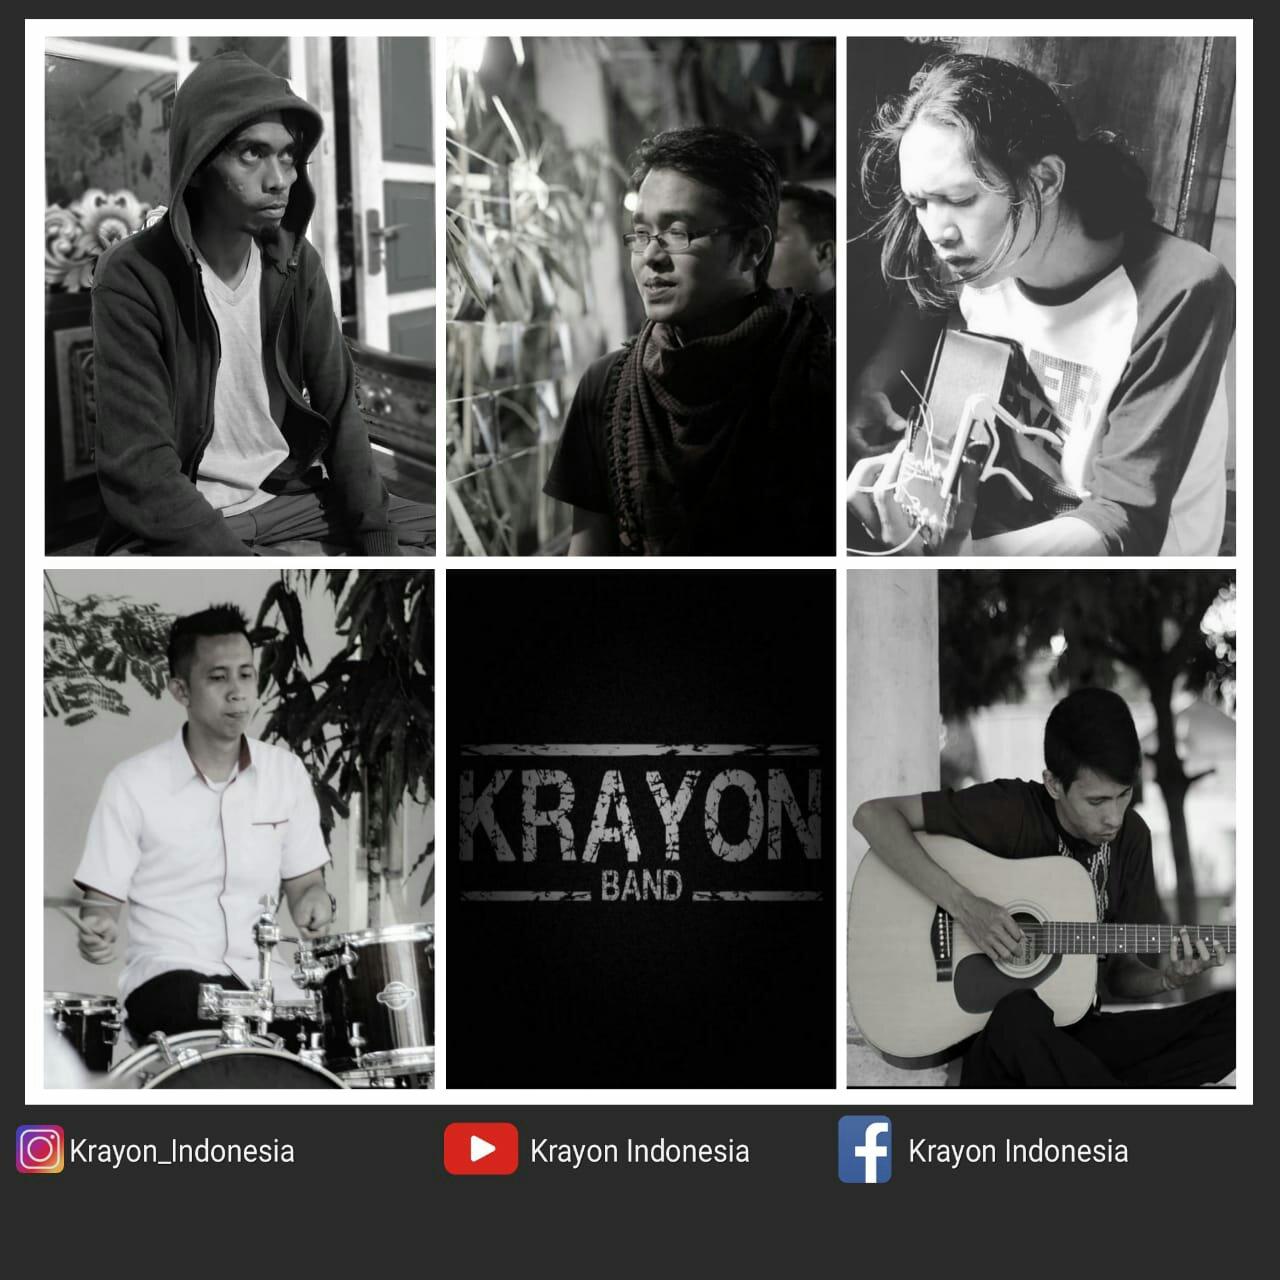 Persembahan di Hari Ibu, 'Krayon,' Band Lokal Kotamobagu Rilis Single 'Bintang di Hatiku'